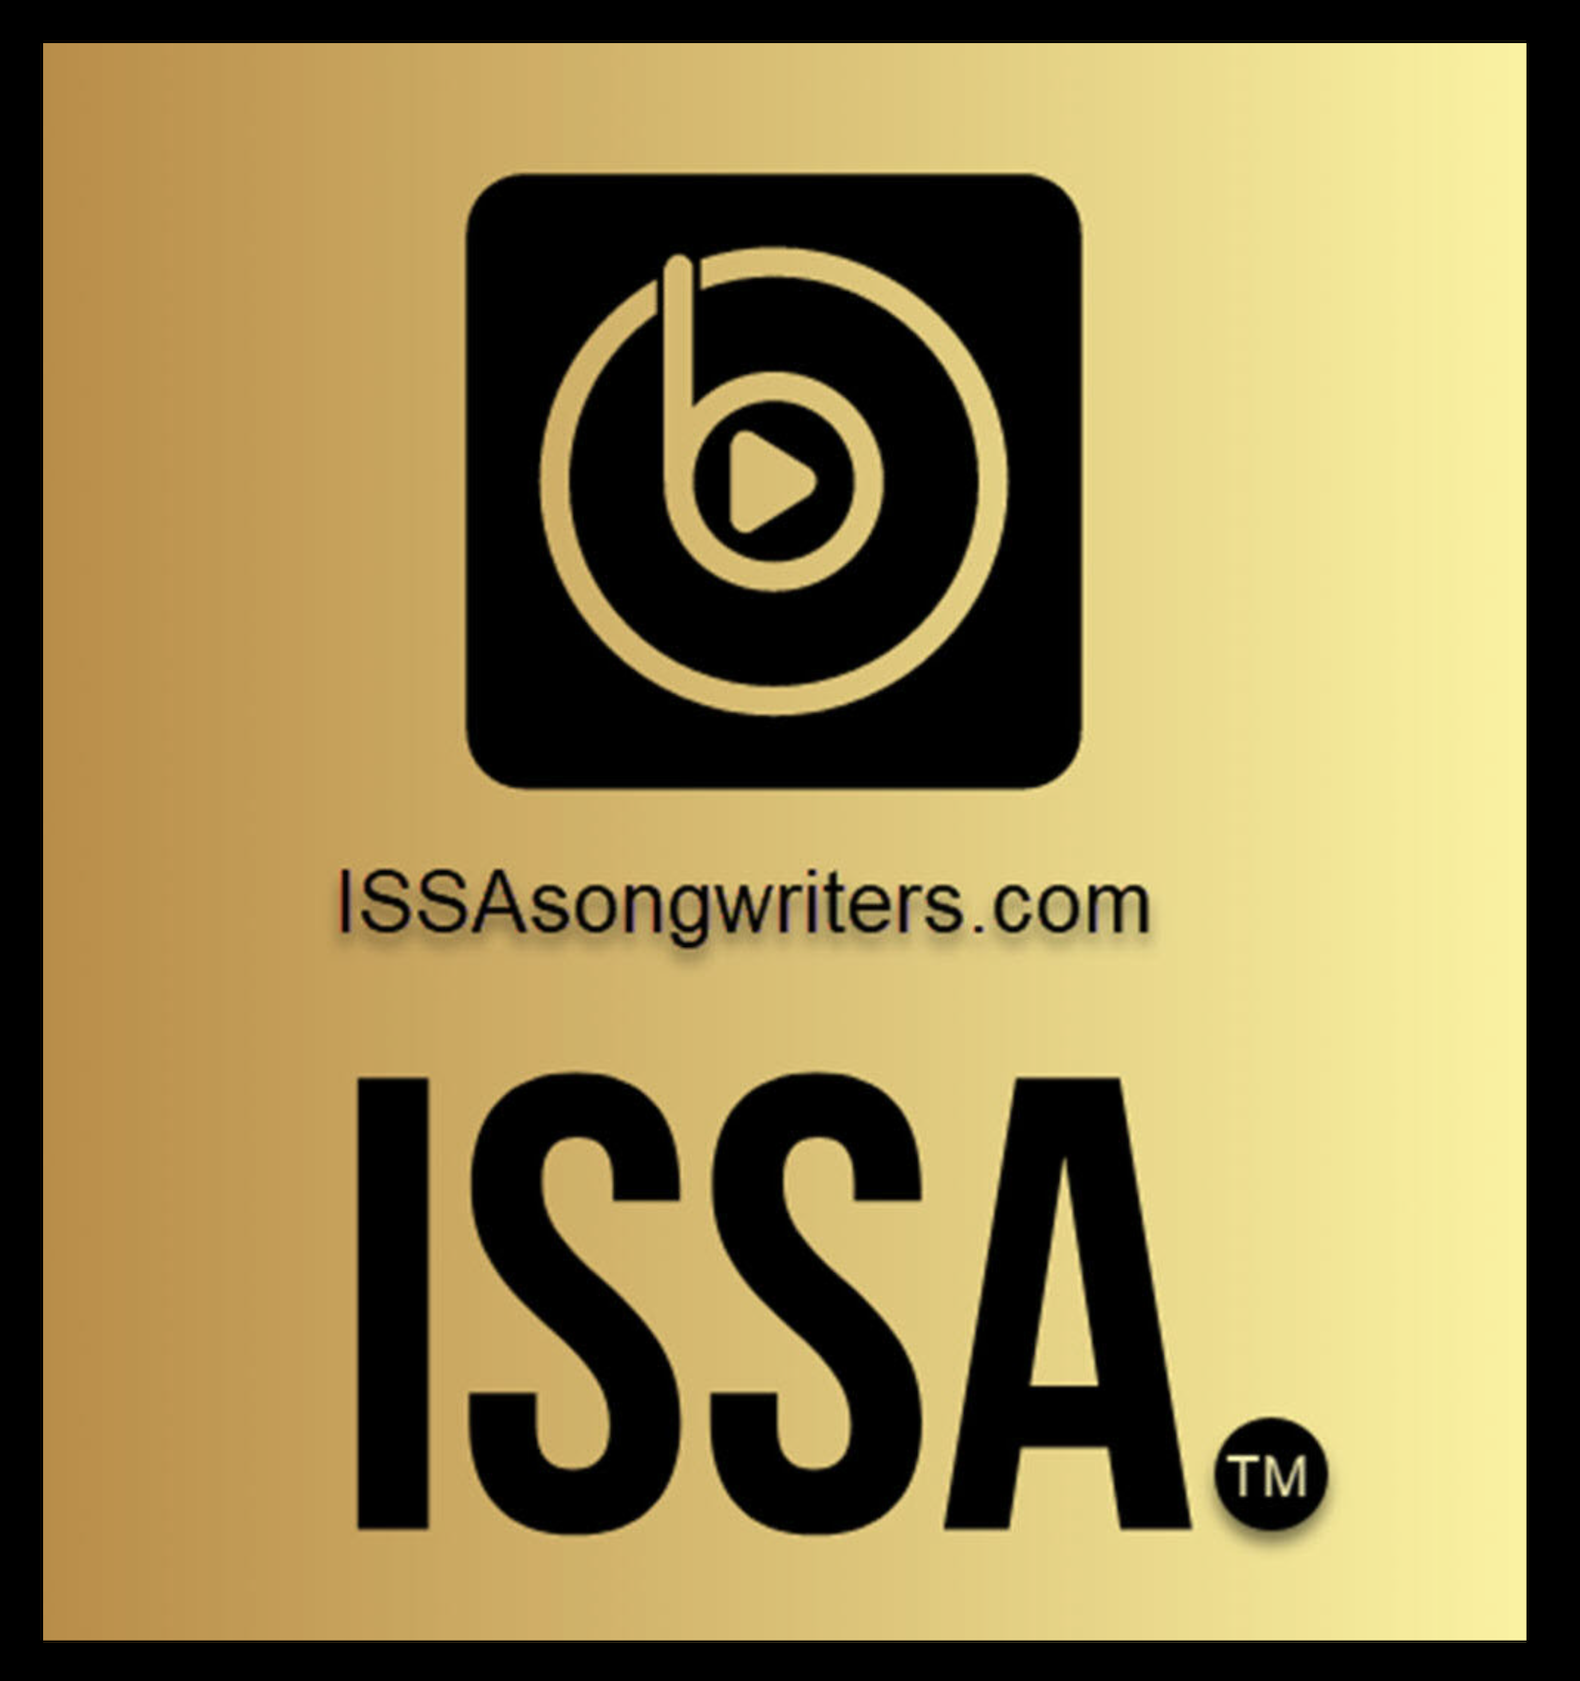 ISSA international singer-songwriters' association and musicinfo